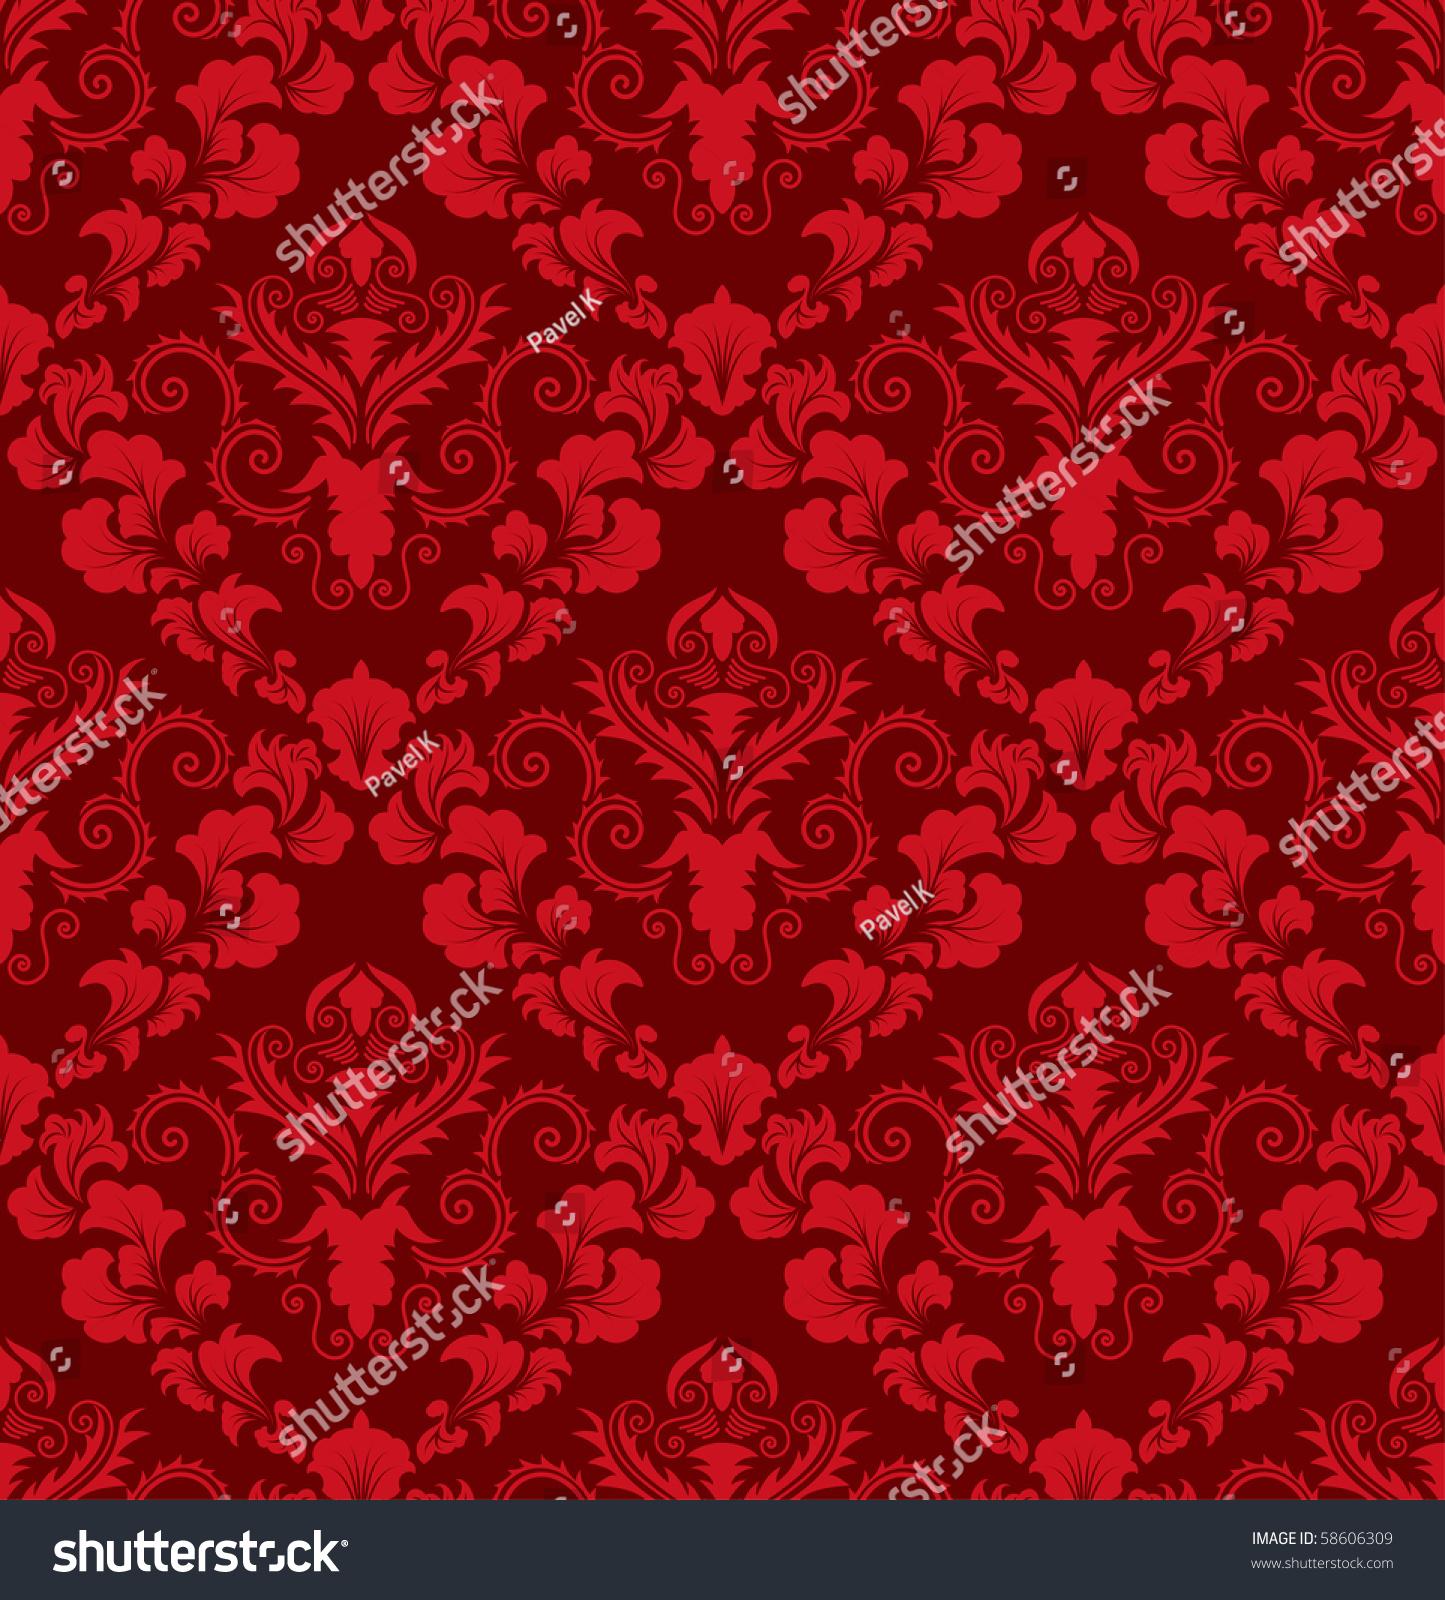 swirling royal pattern wallpaper - photo #23